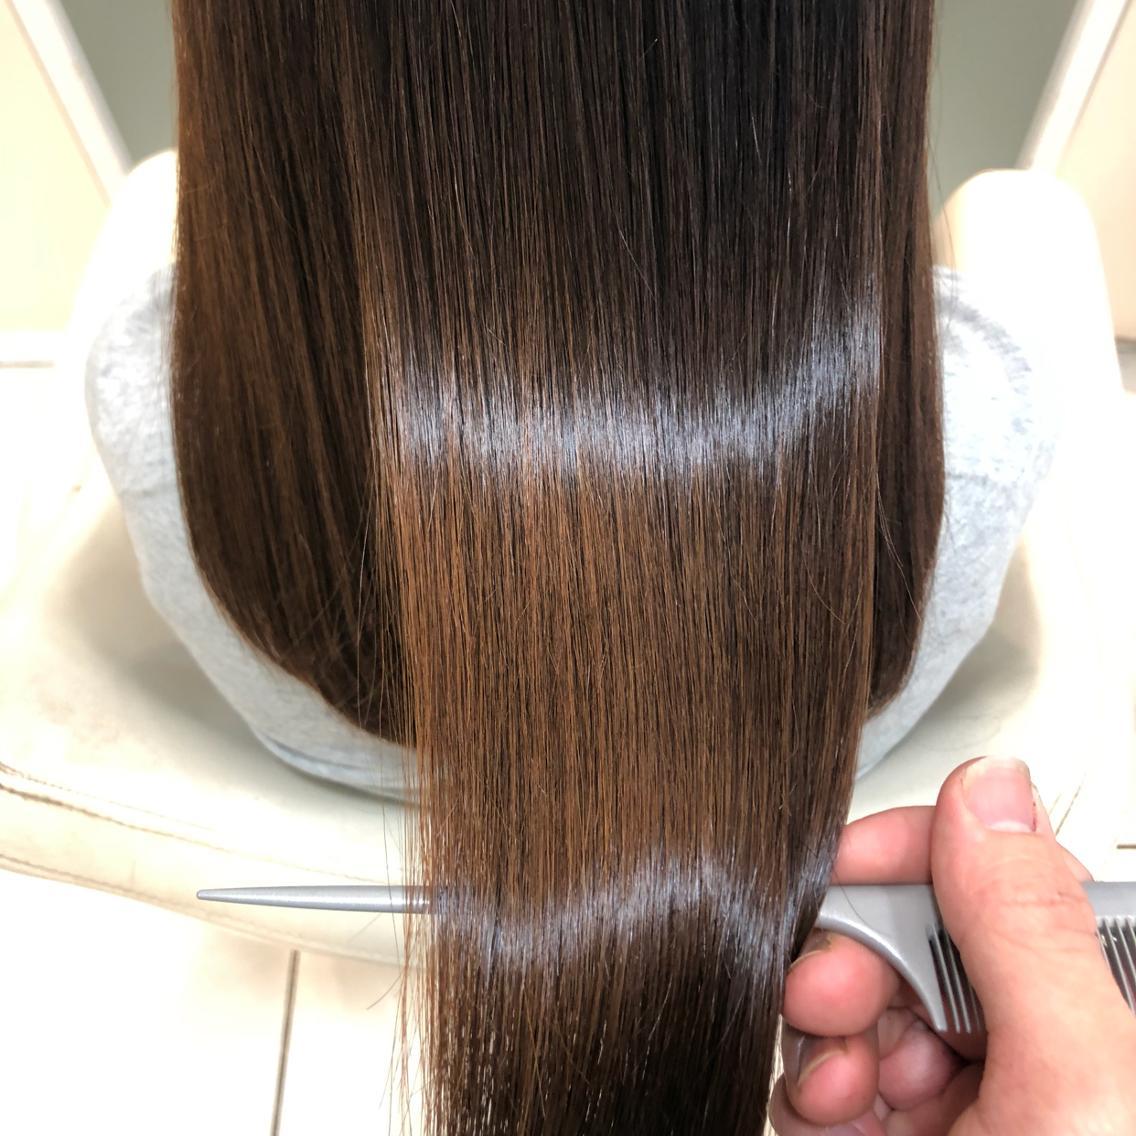 ❤️髪質改善縮毛矯正¥5940🧡ダメージレス縮毛矯正💙ノーダメージ縮毛矯正🖤柔らかい質感、極上のツヤ髪、最上級の美髪をお約束します💚ブリーチ毛、ハイダメージ毛もお任せください💛副店長担当💜